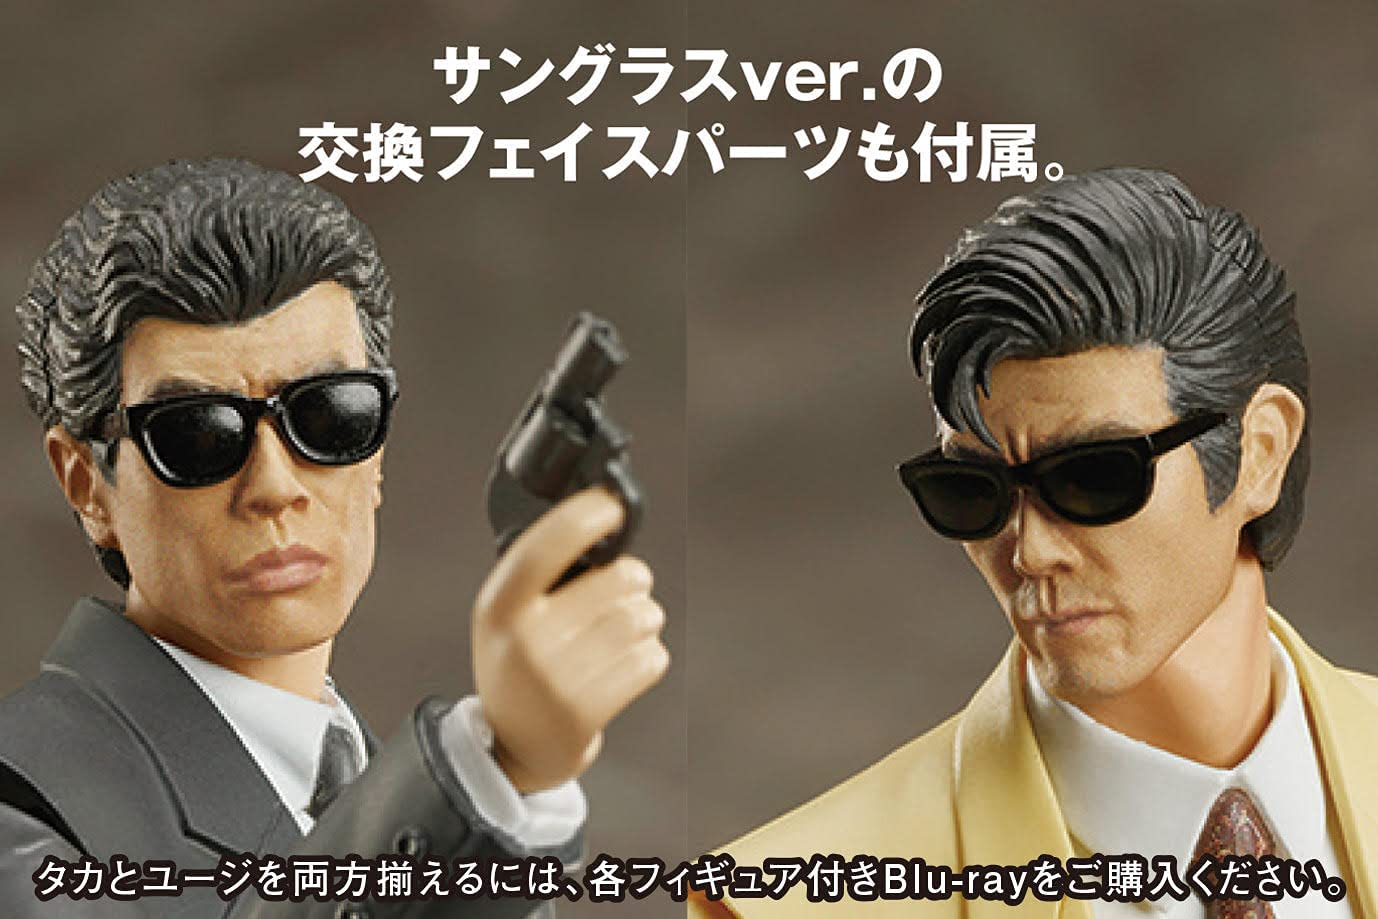 【DB】あぶない刑事 Blu-ray BOX VOL,1『タカフィギュア付き』完全予約限定生産-021